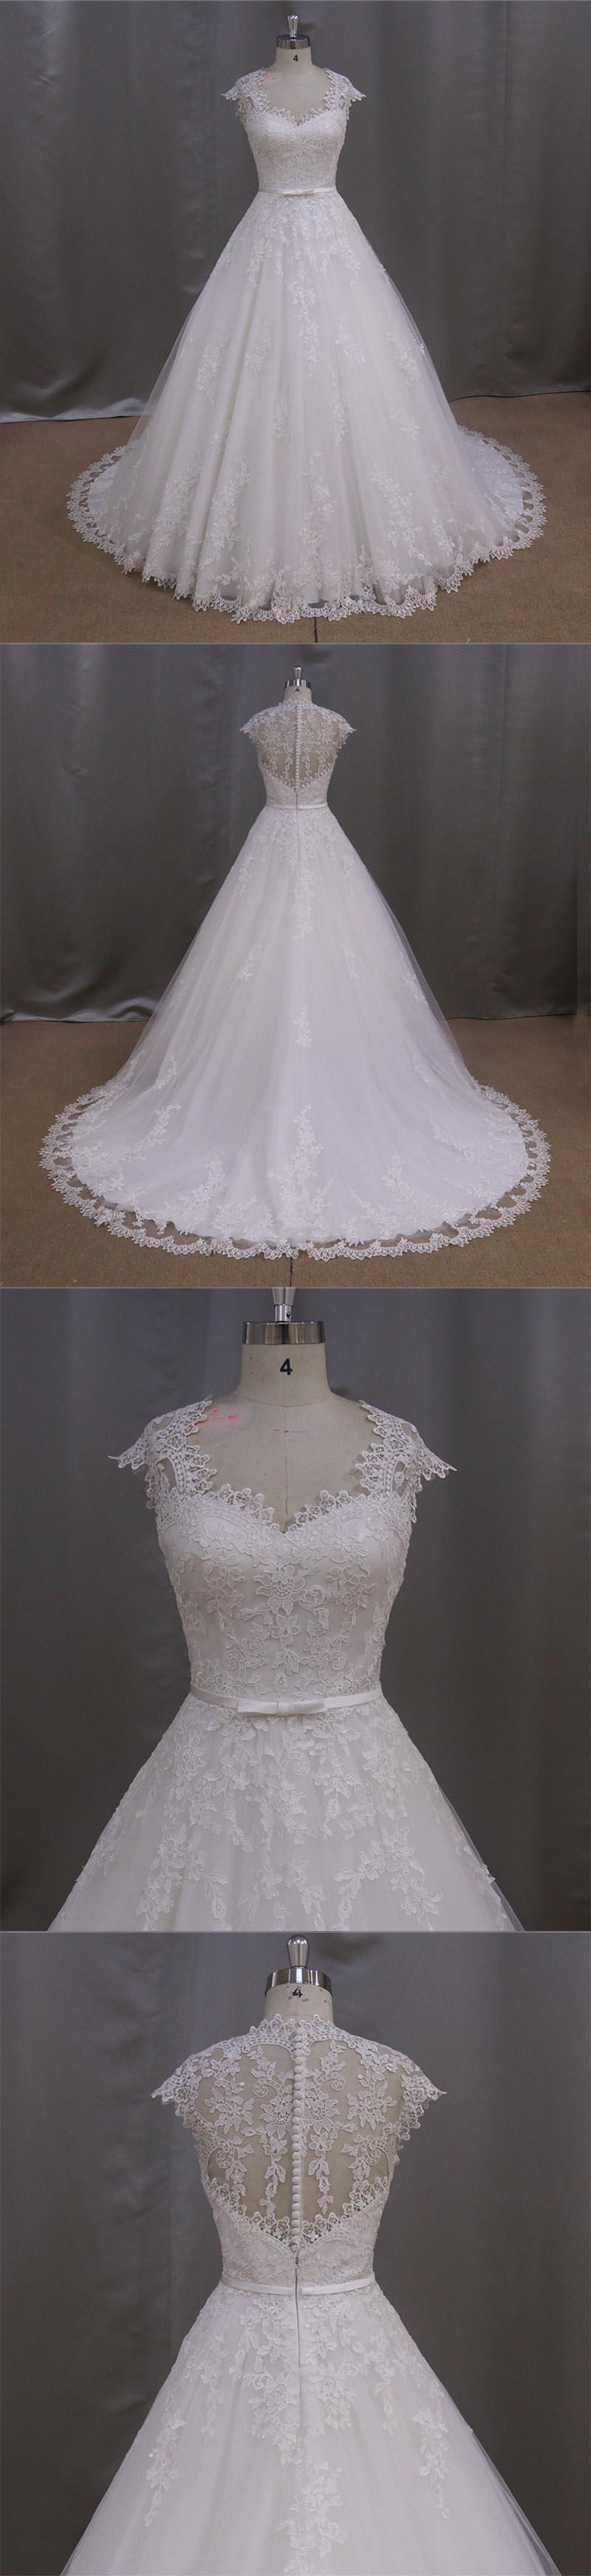 2016 Newest Cap Sleeve Sheer Back A Line Lace Bridal Wedding Dress